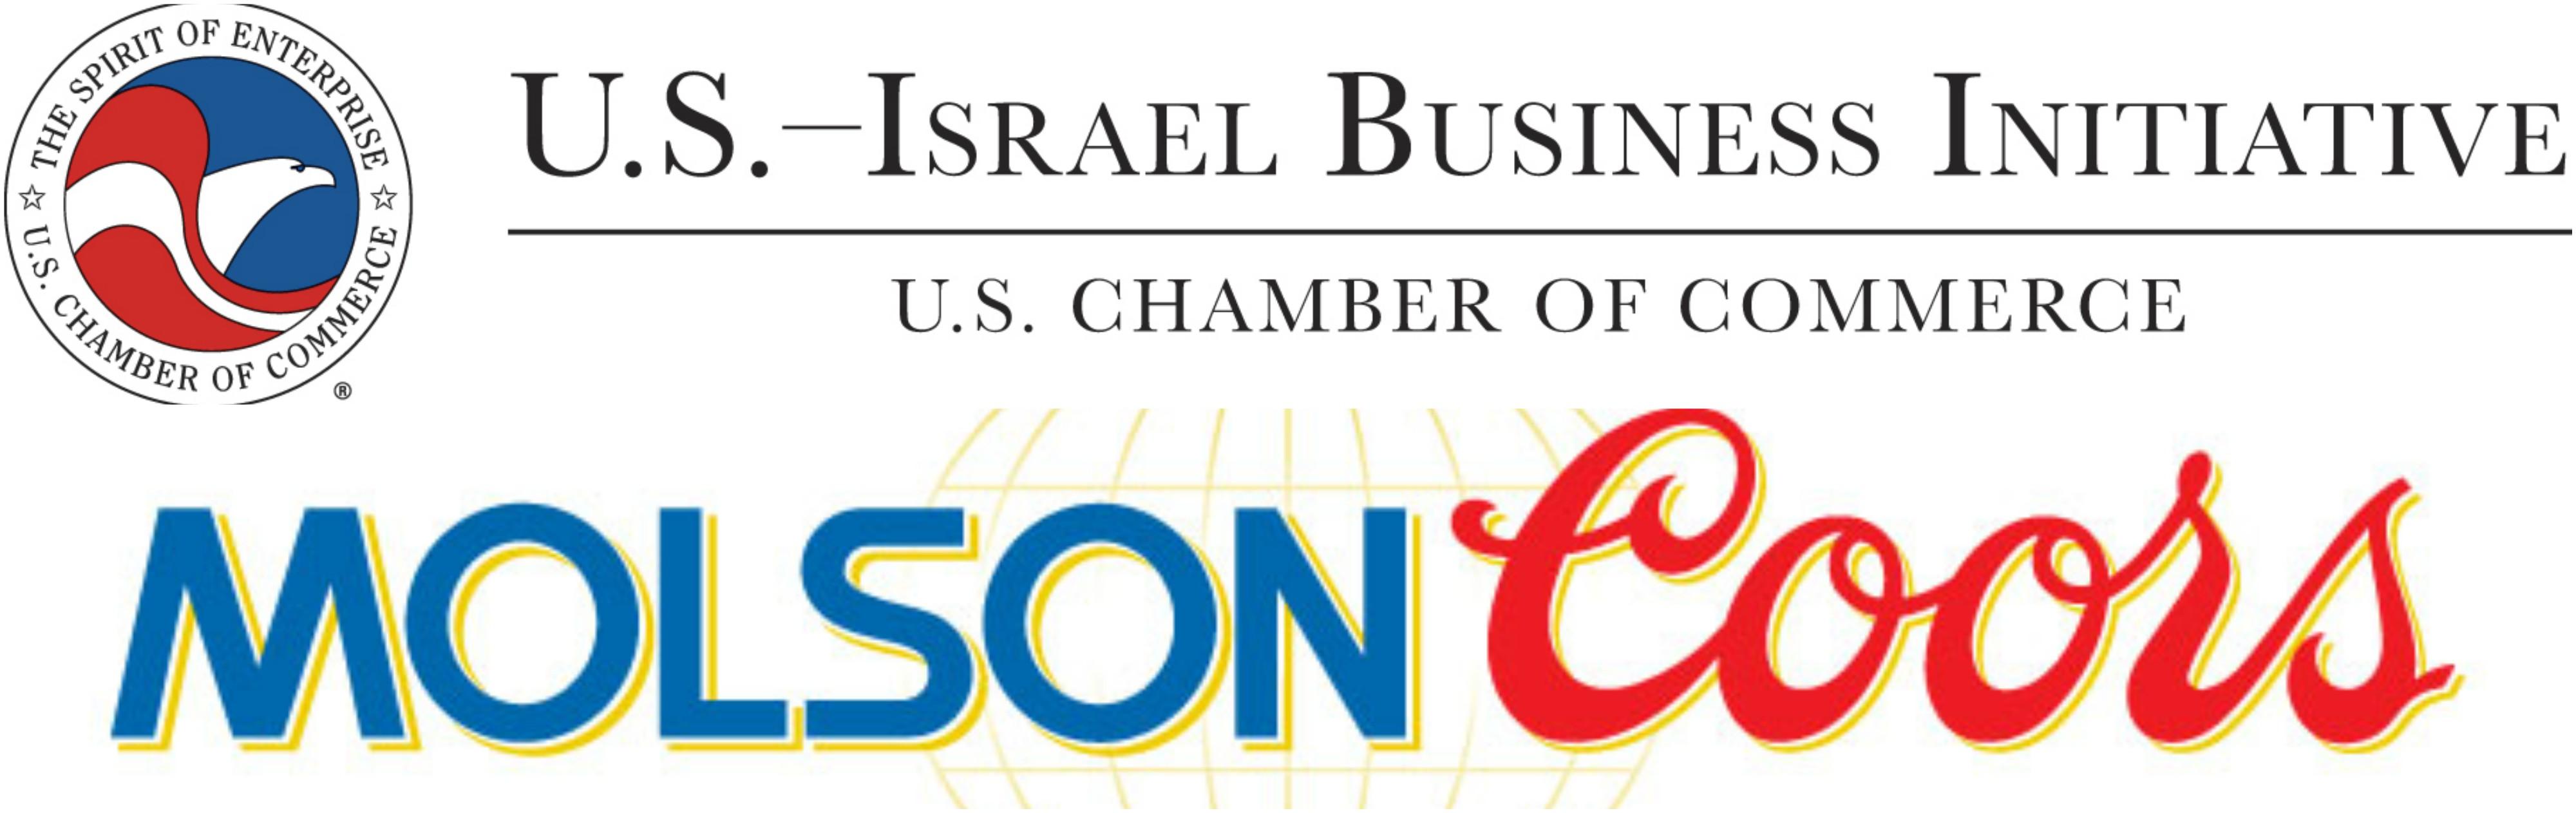 BusinessH2O partners